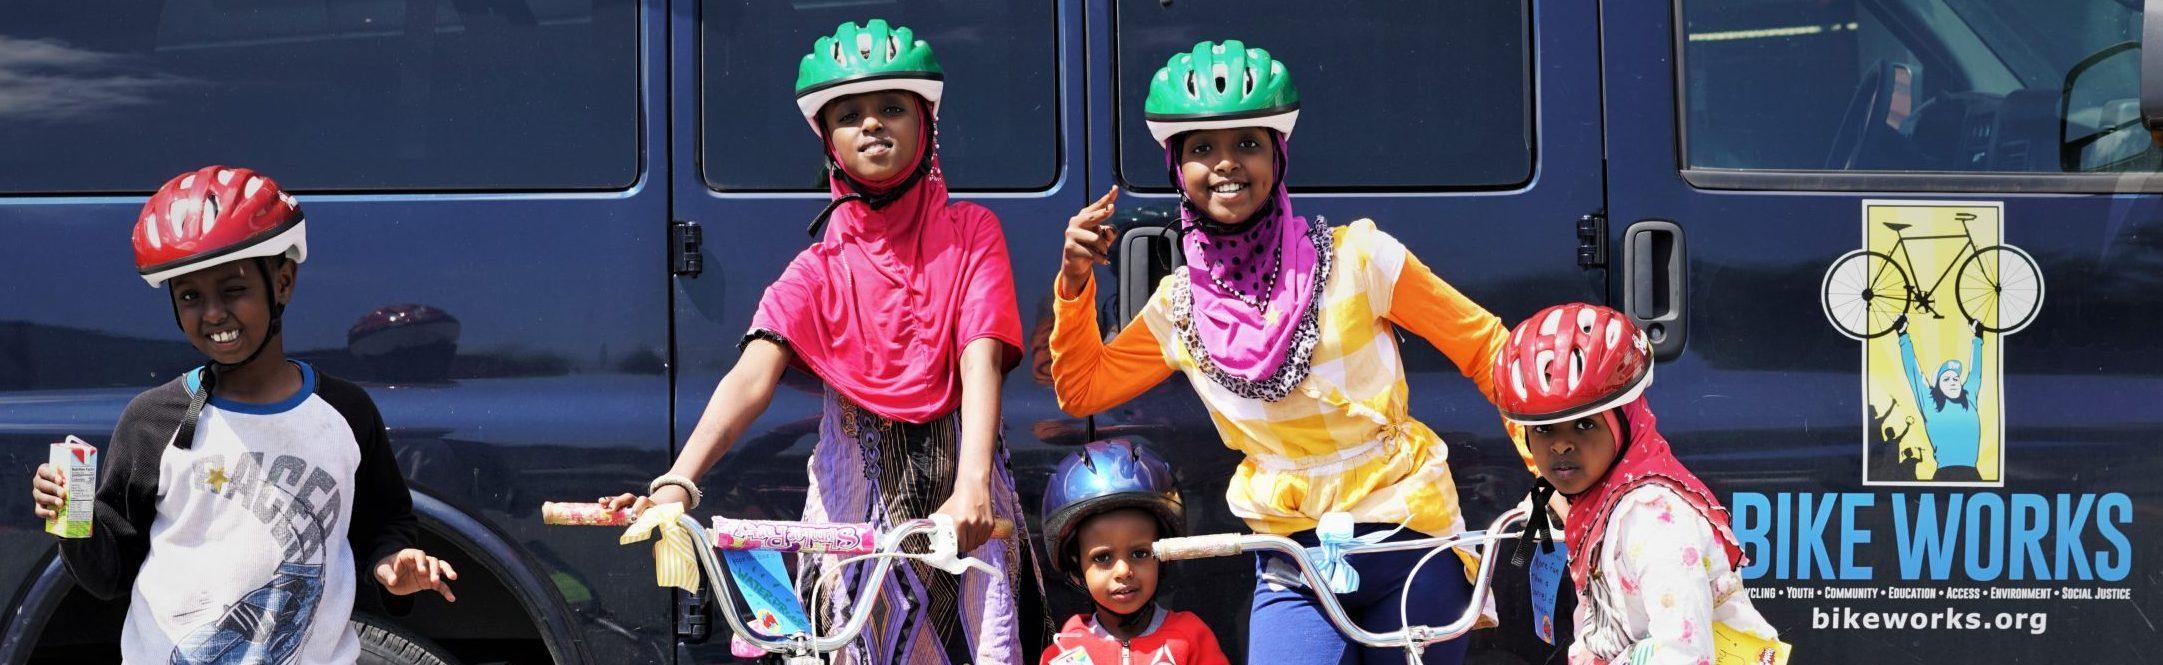 Five kids in bicycle helmets posing with bicycles in front of a navy blue Bike Works van.